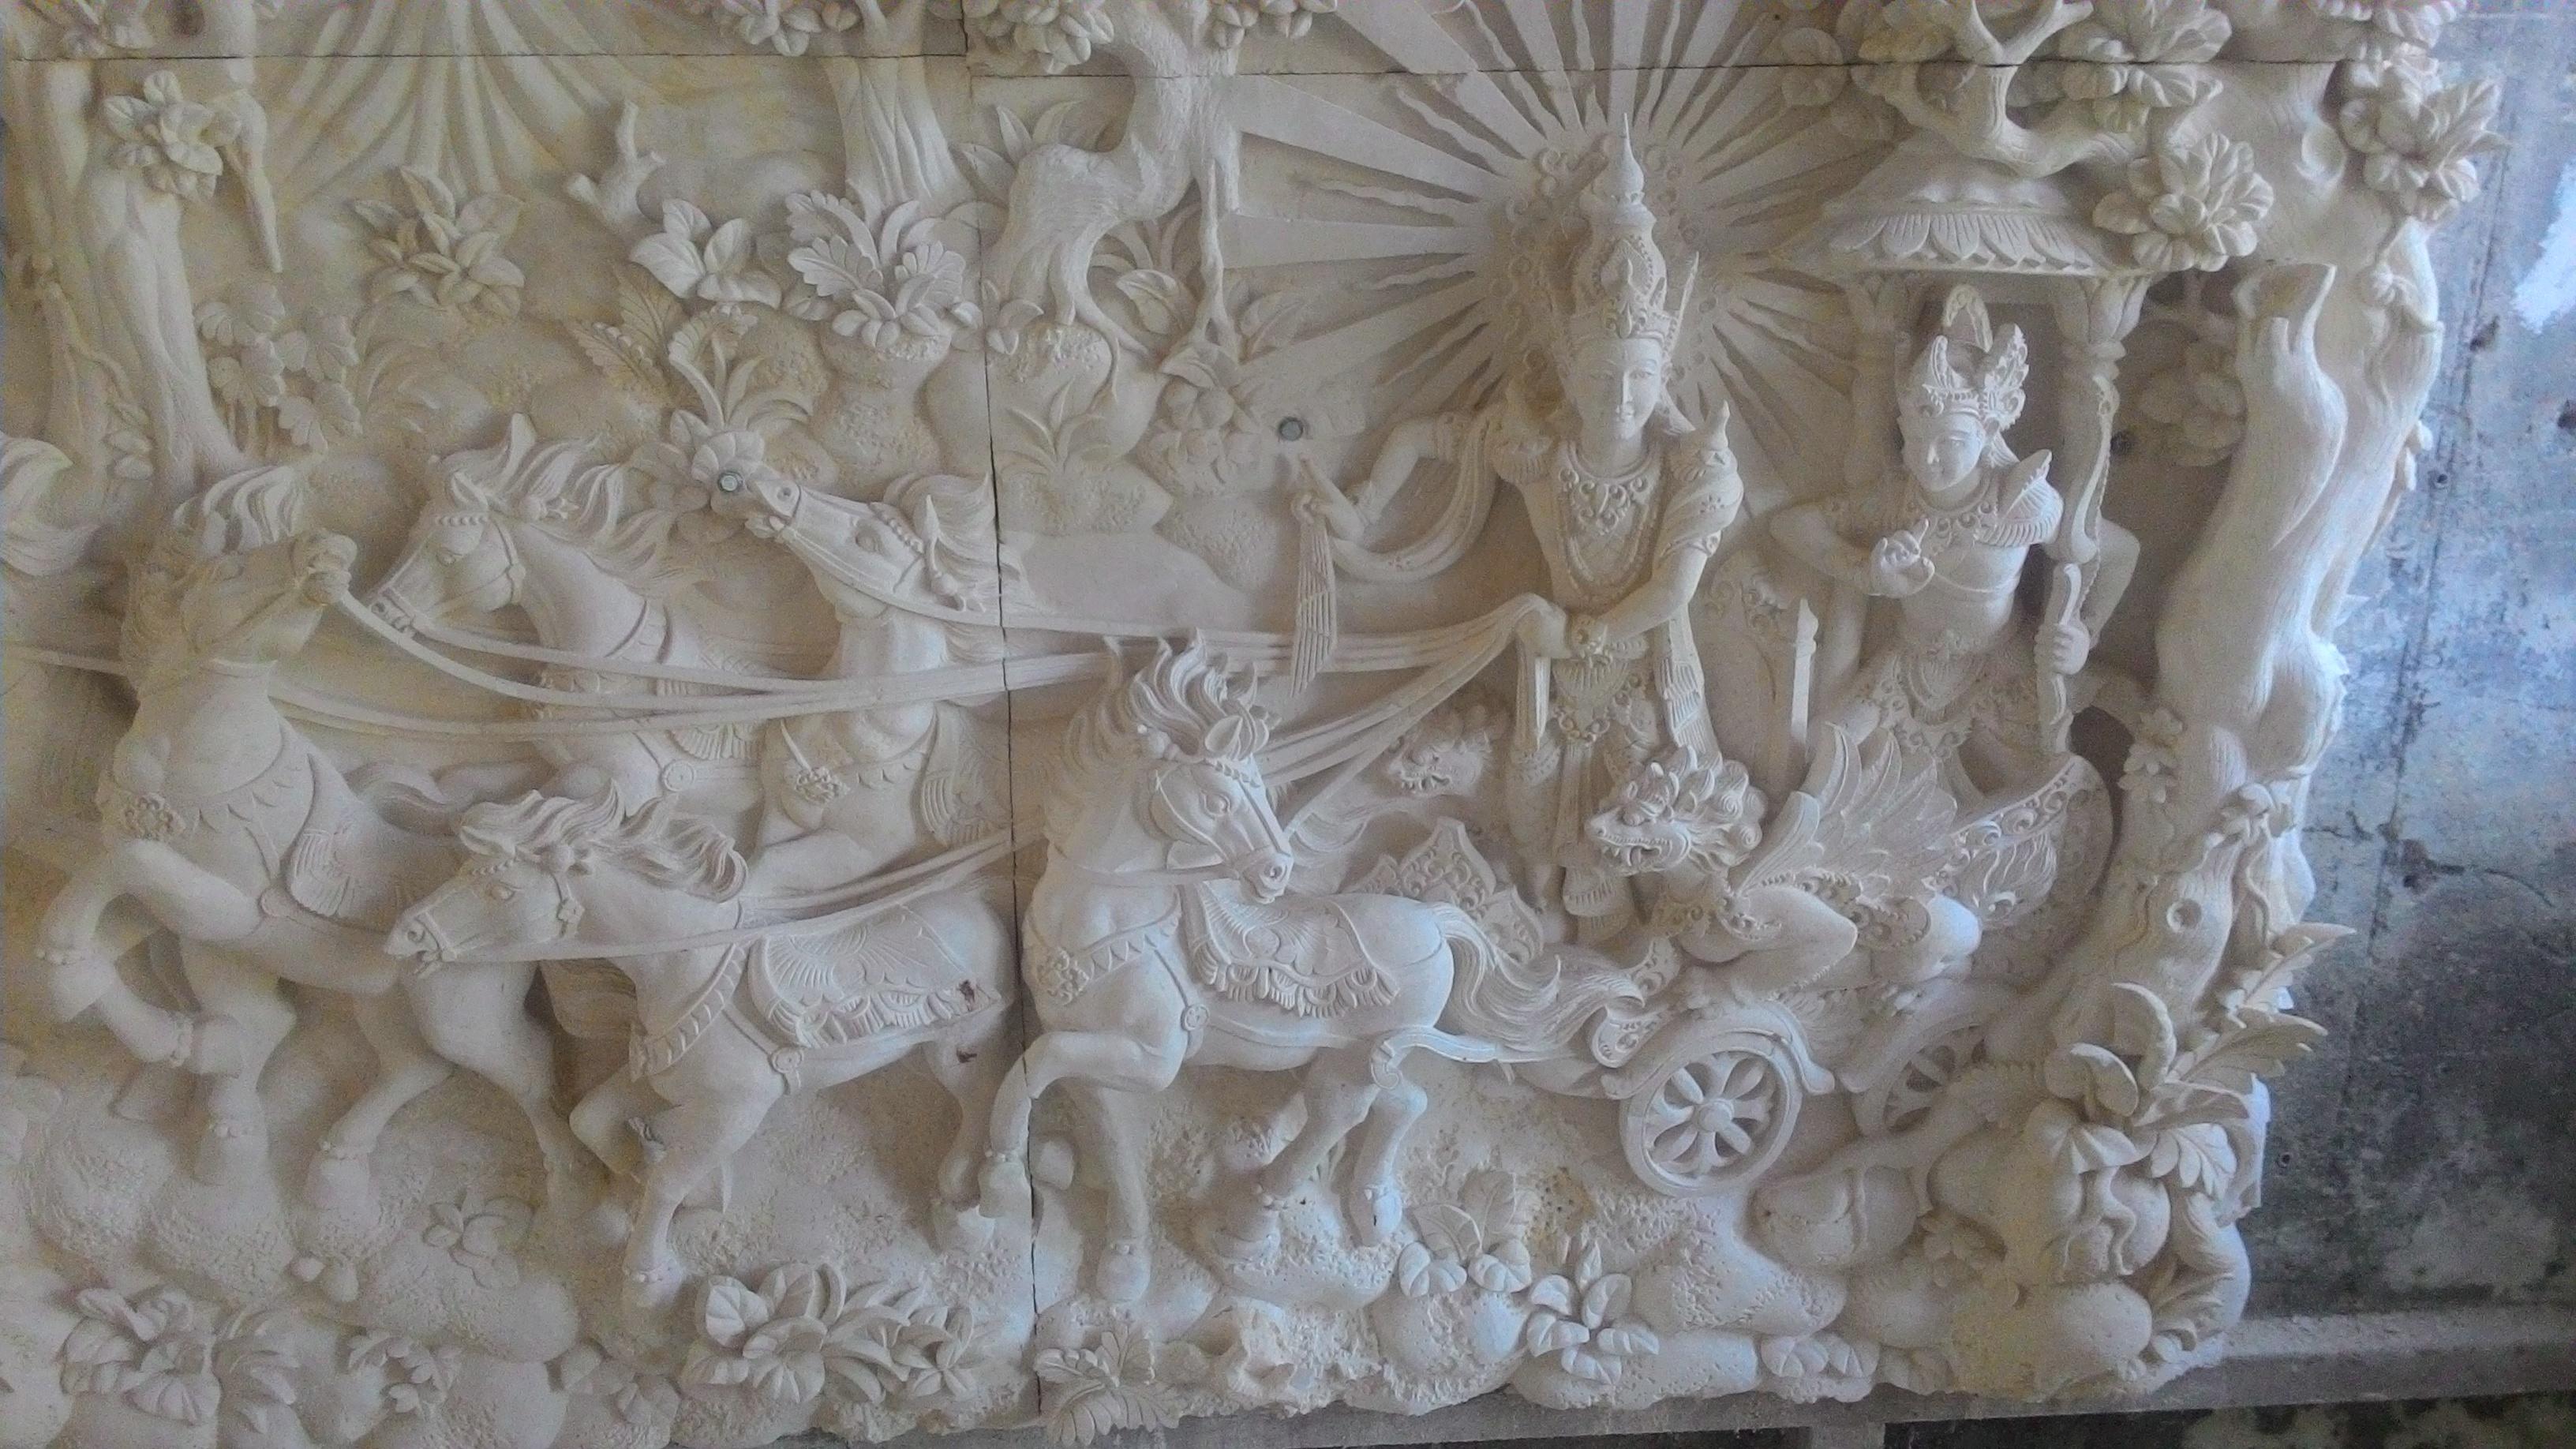 Relief ukiran motif mahabarata.